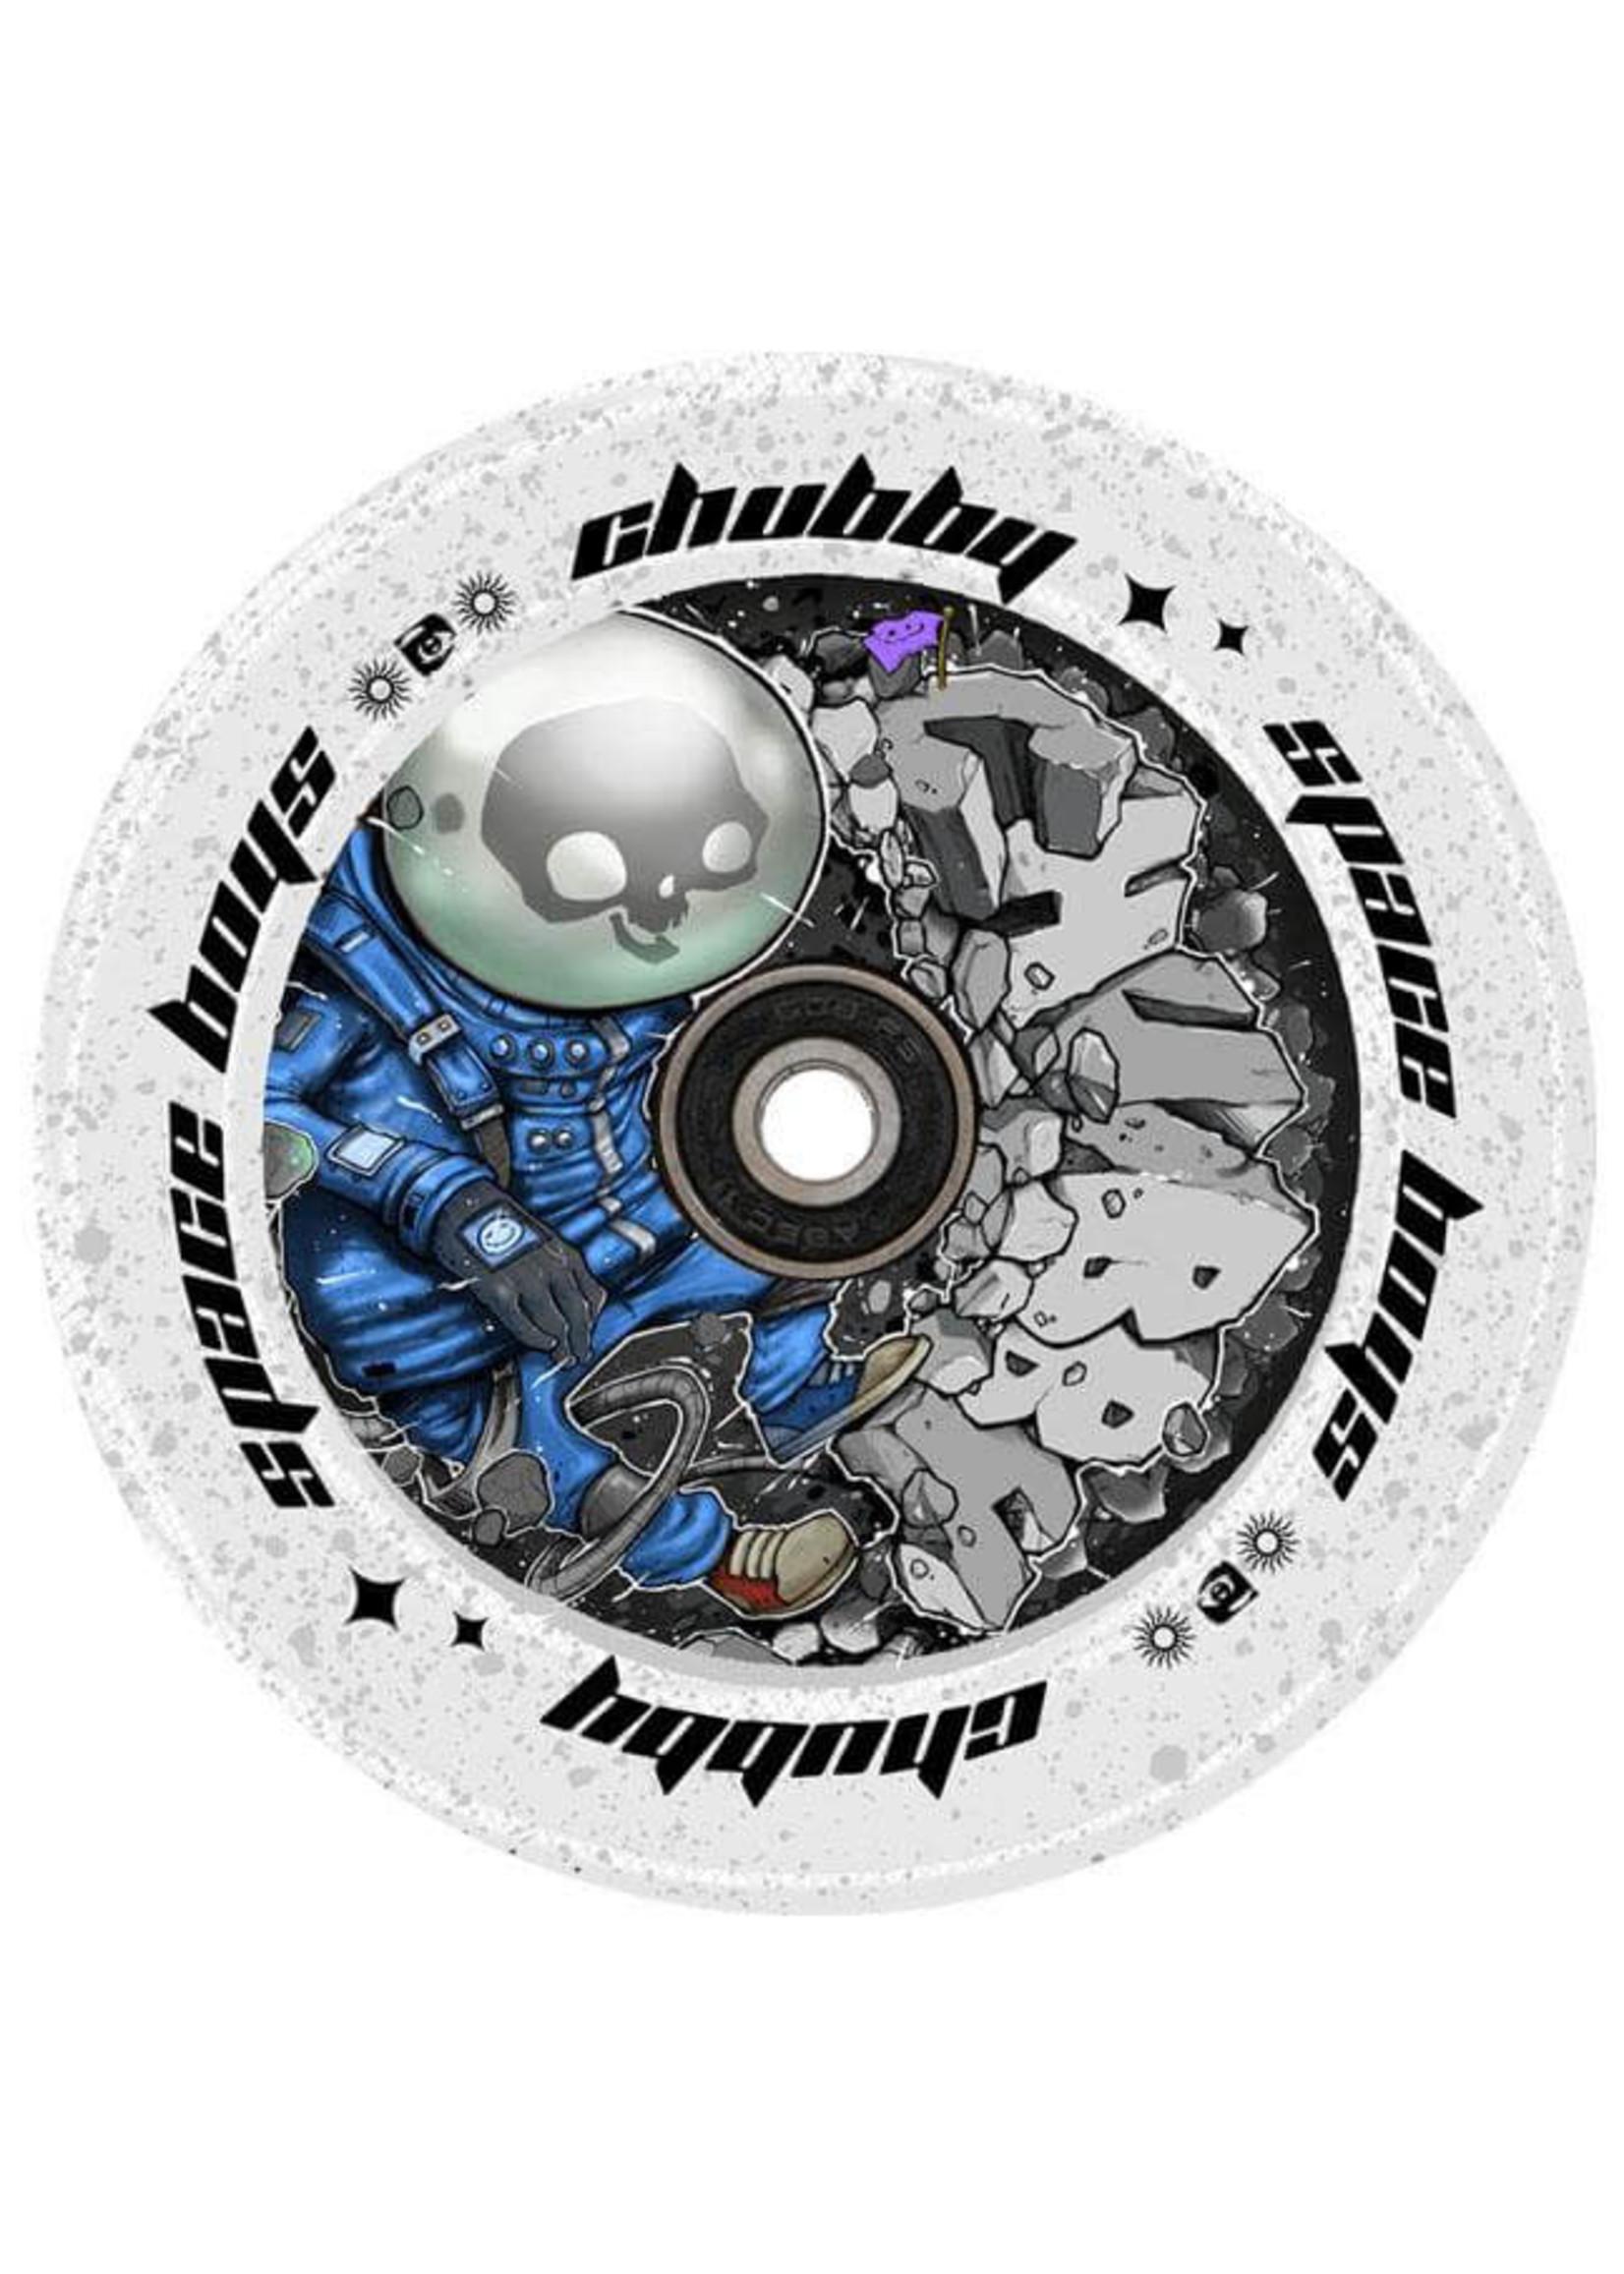 Chubby Chubby - Spaceboy Wheels - 110mm